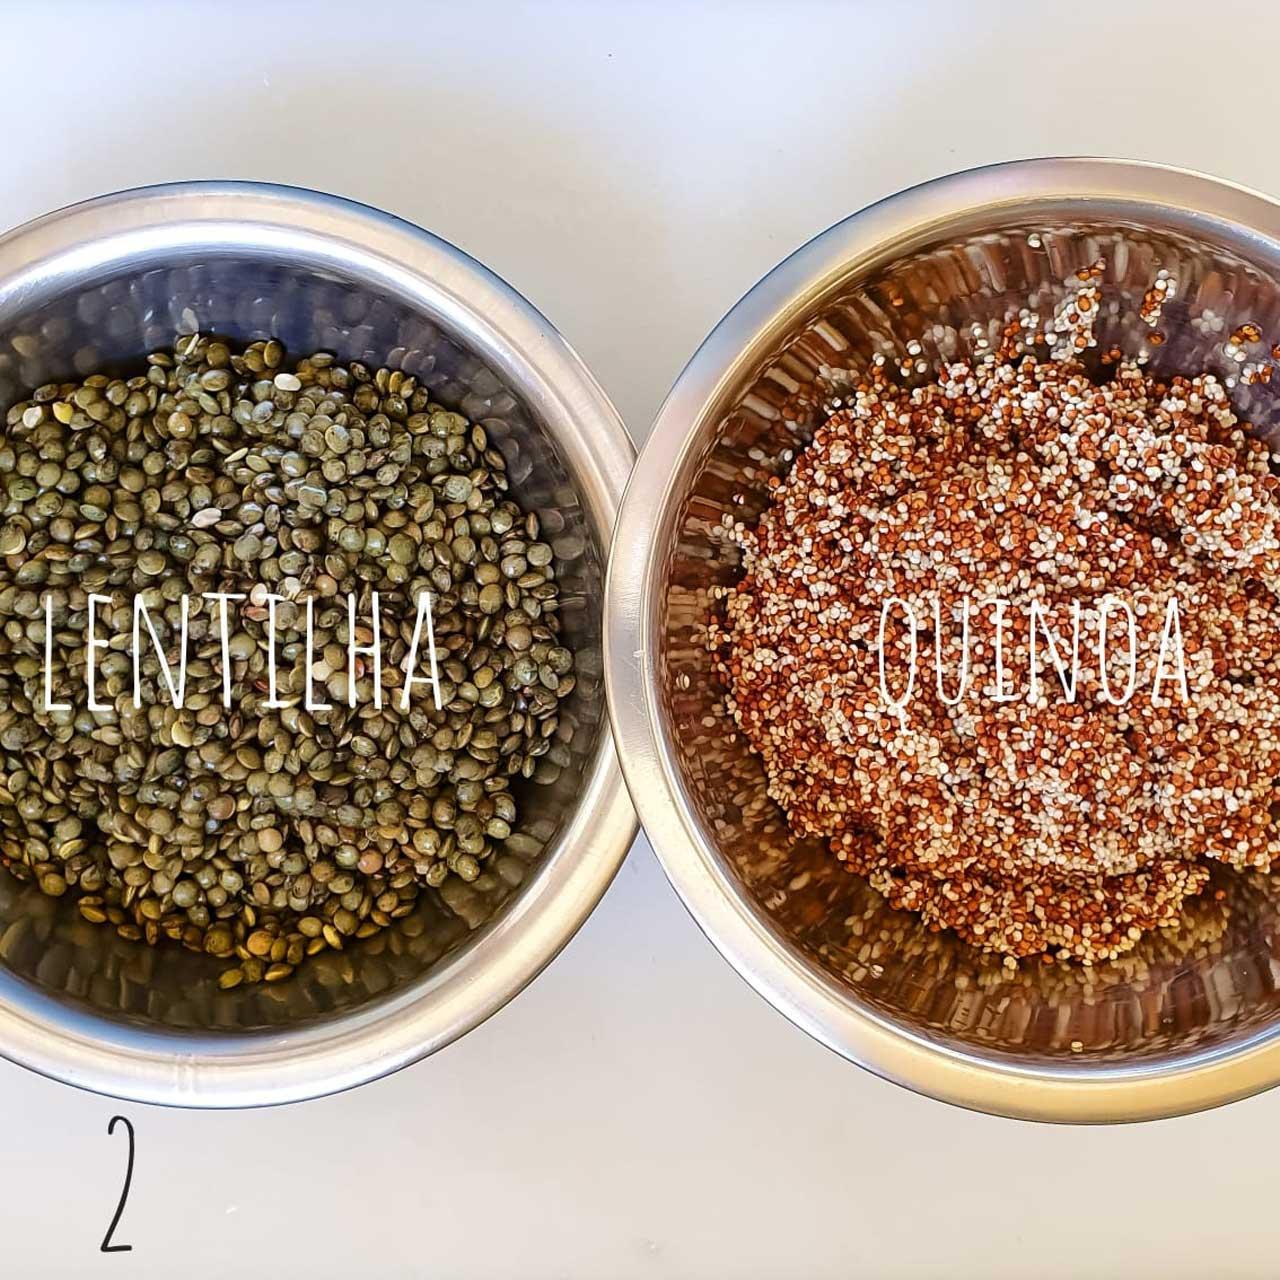 lentilha-quinoa-e-couve-02